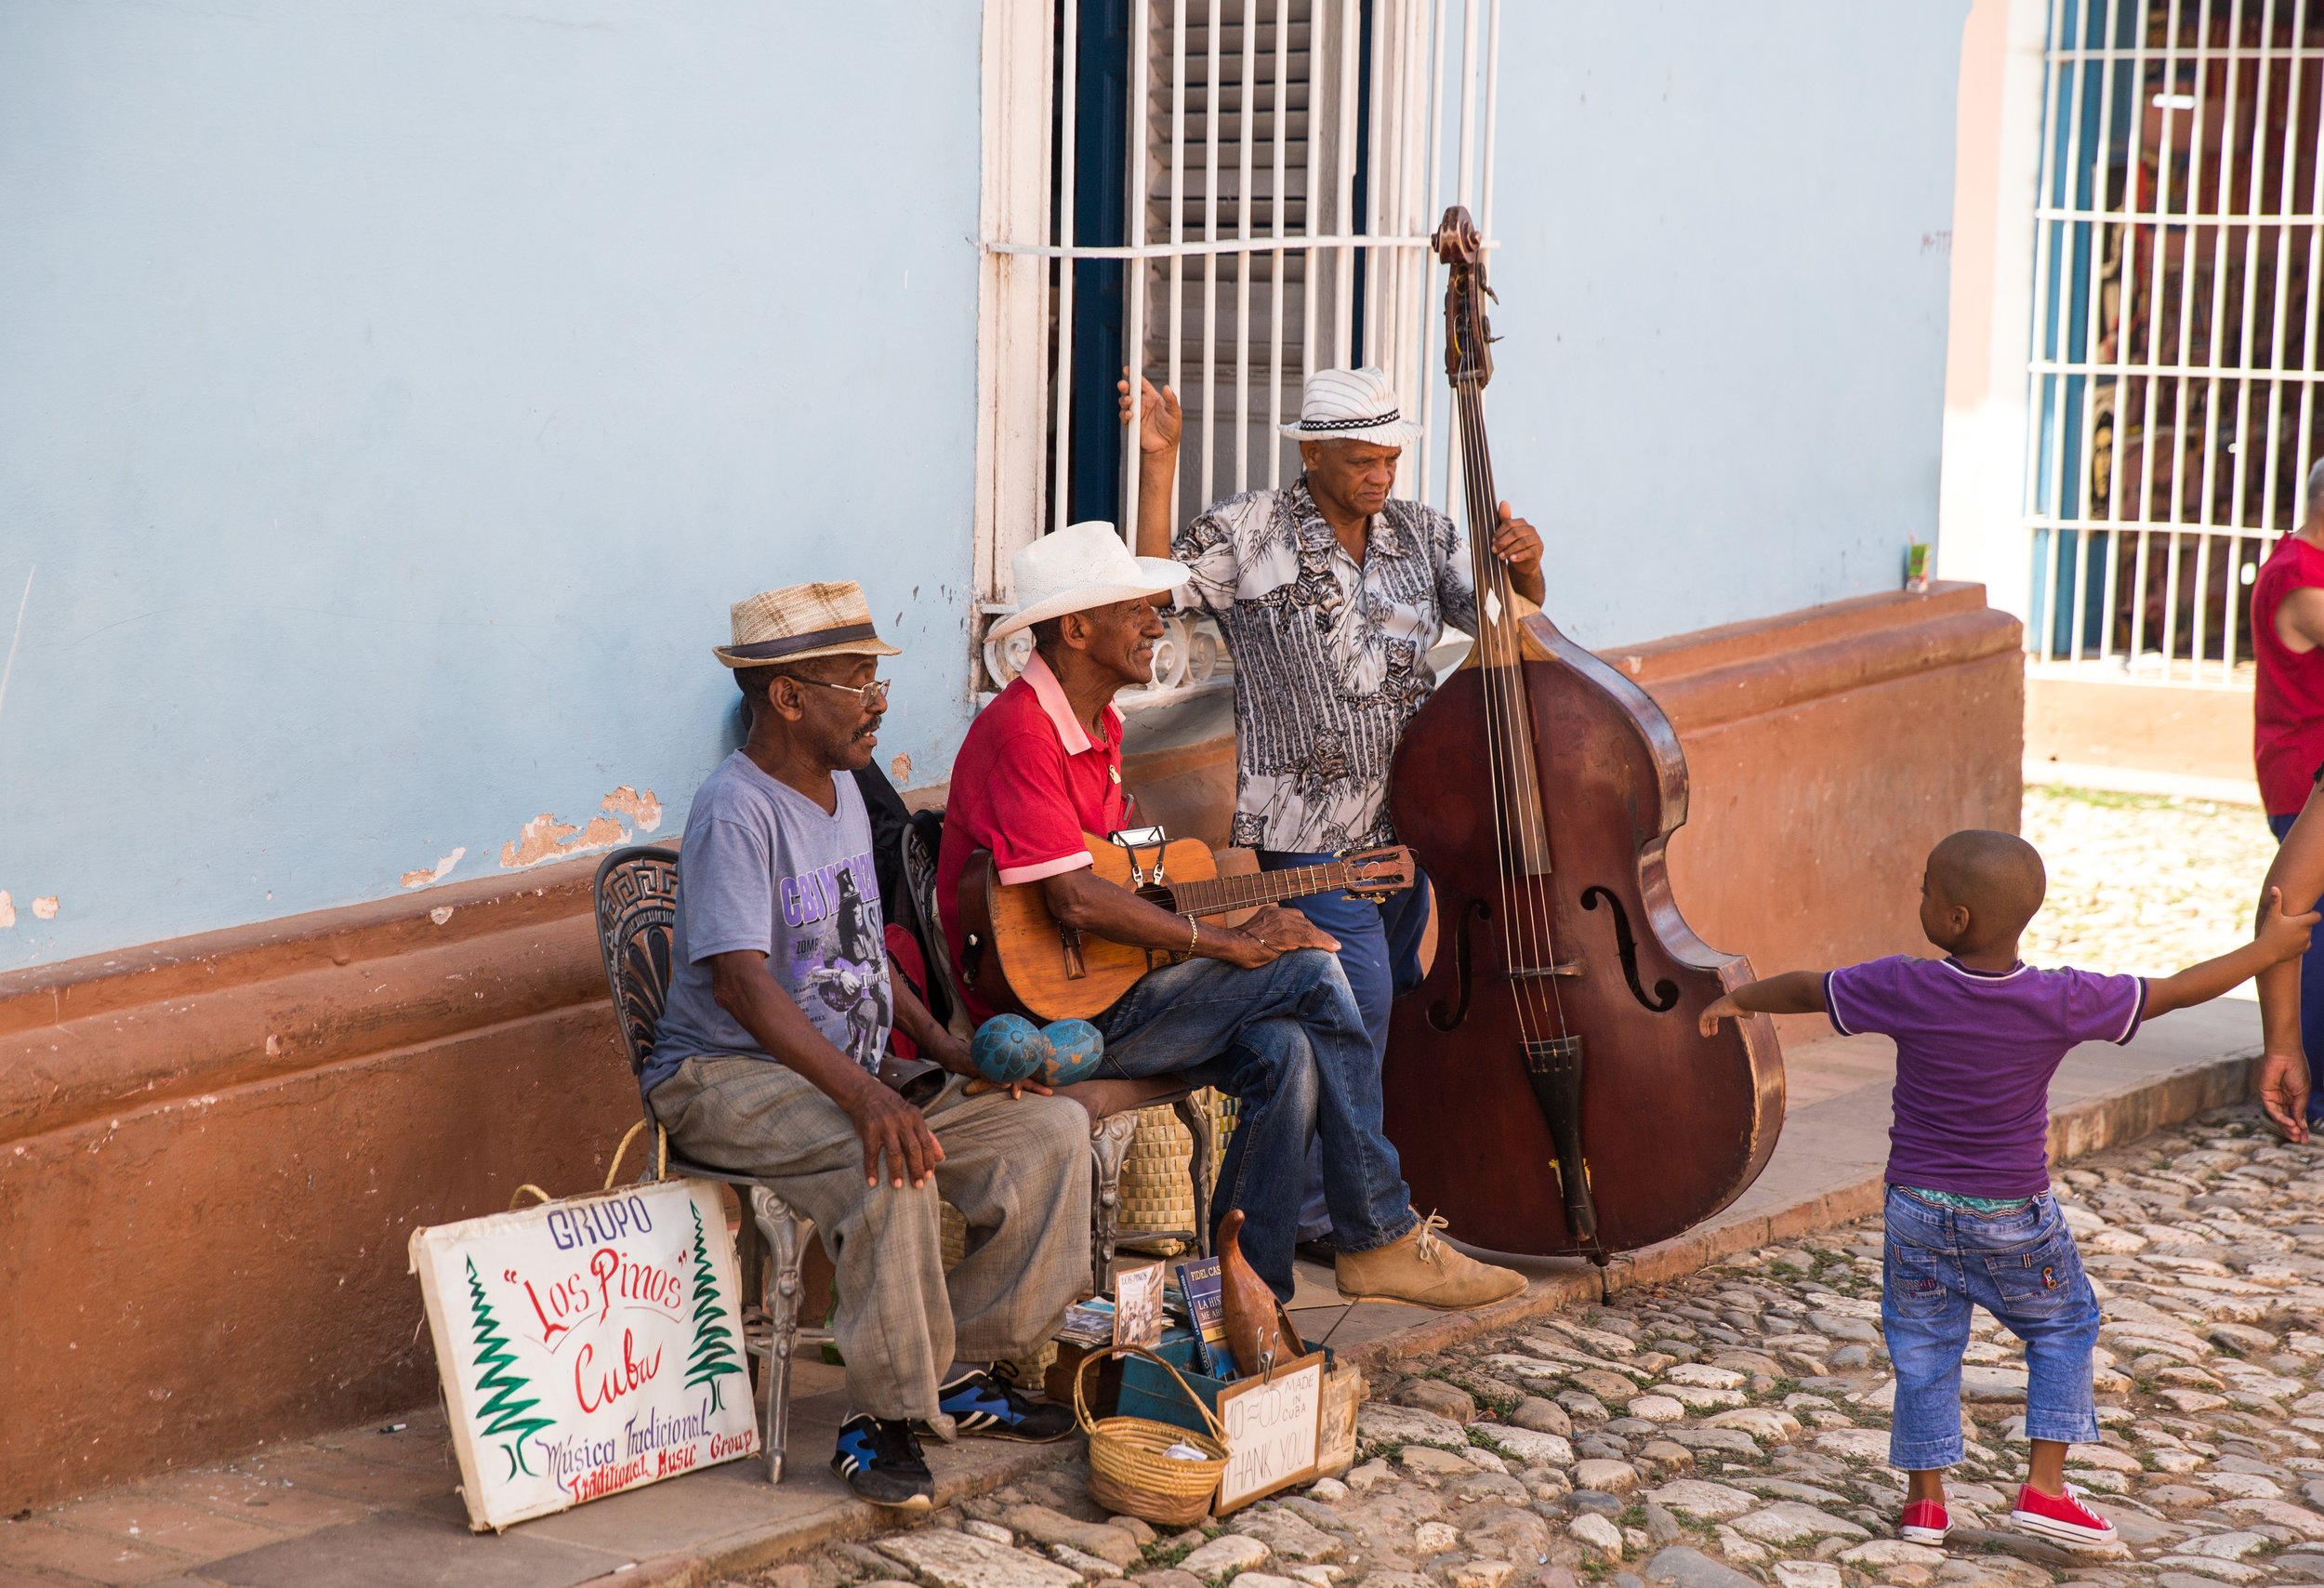 Los Pinos takes a break while a young Cuban boy admires the trio.